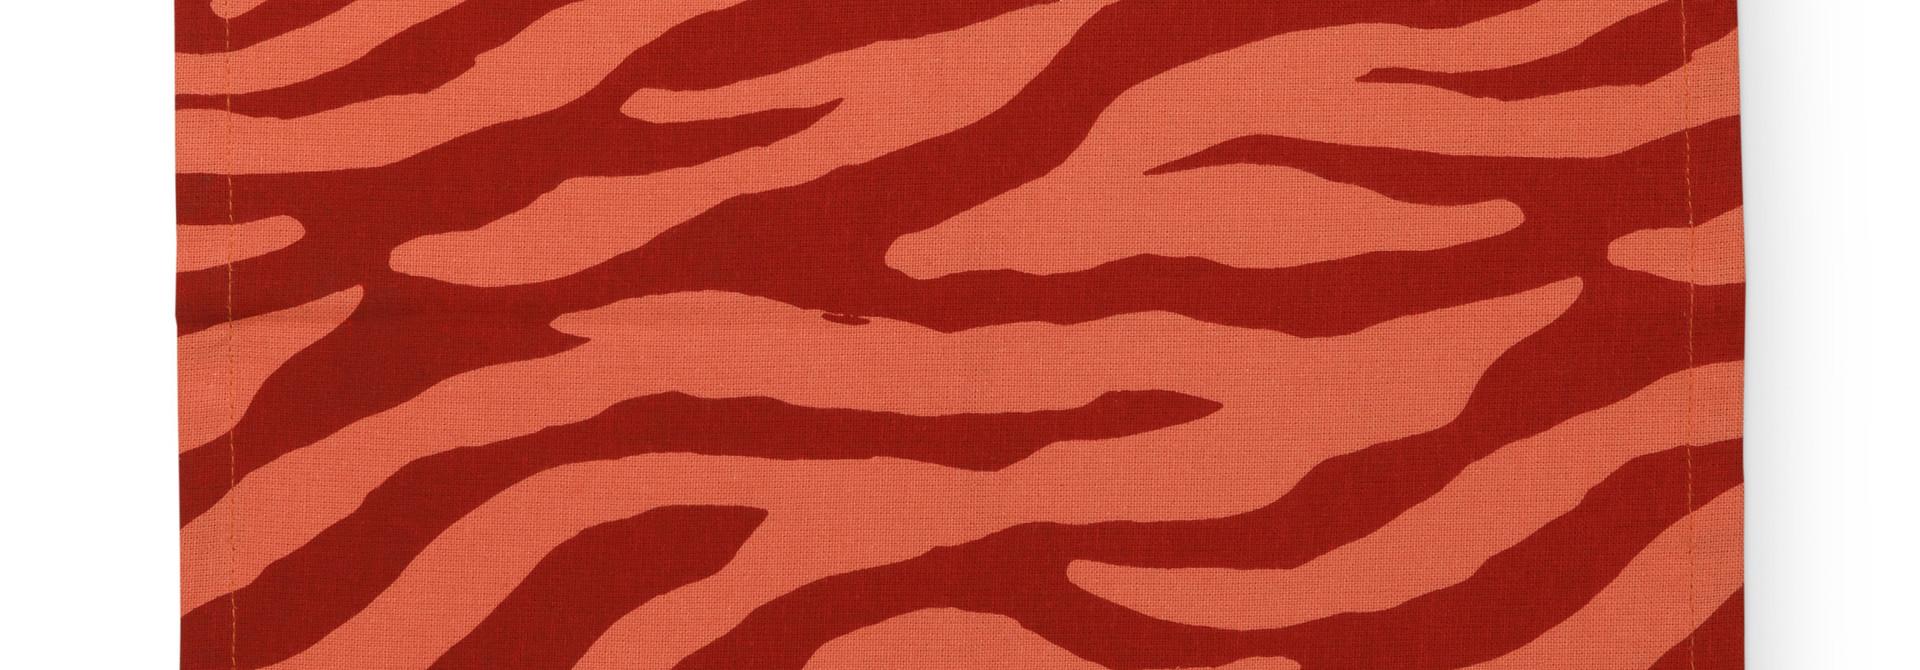 Napkin Zebra Stripes 35x35cm